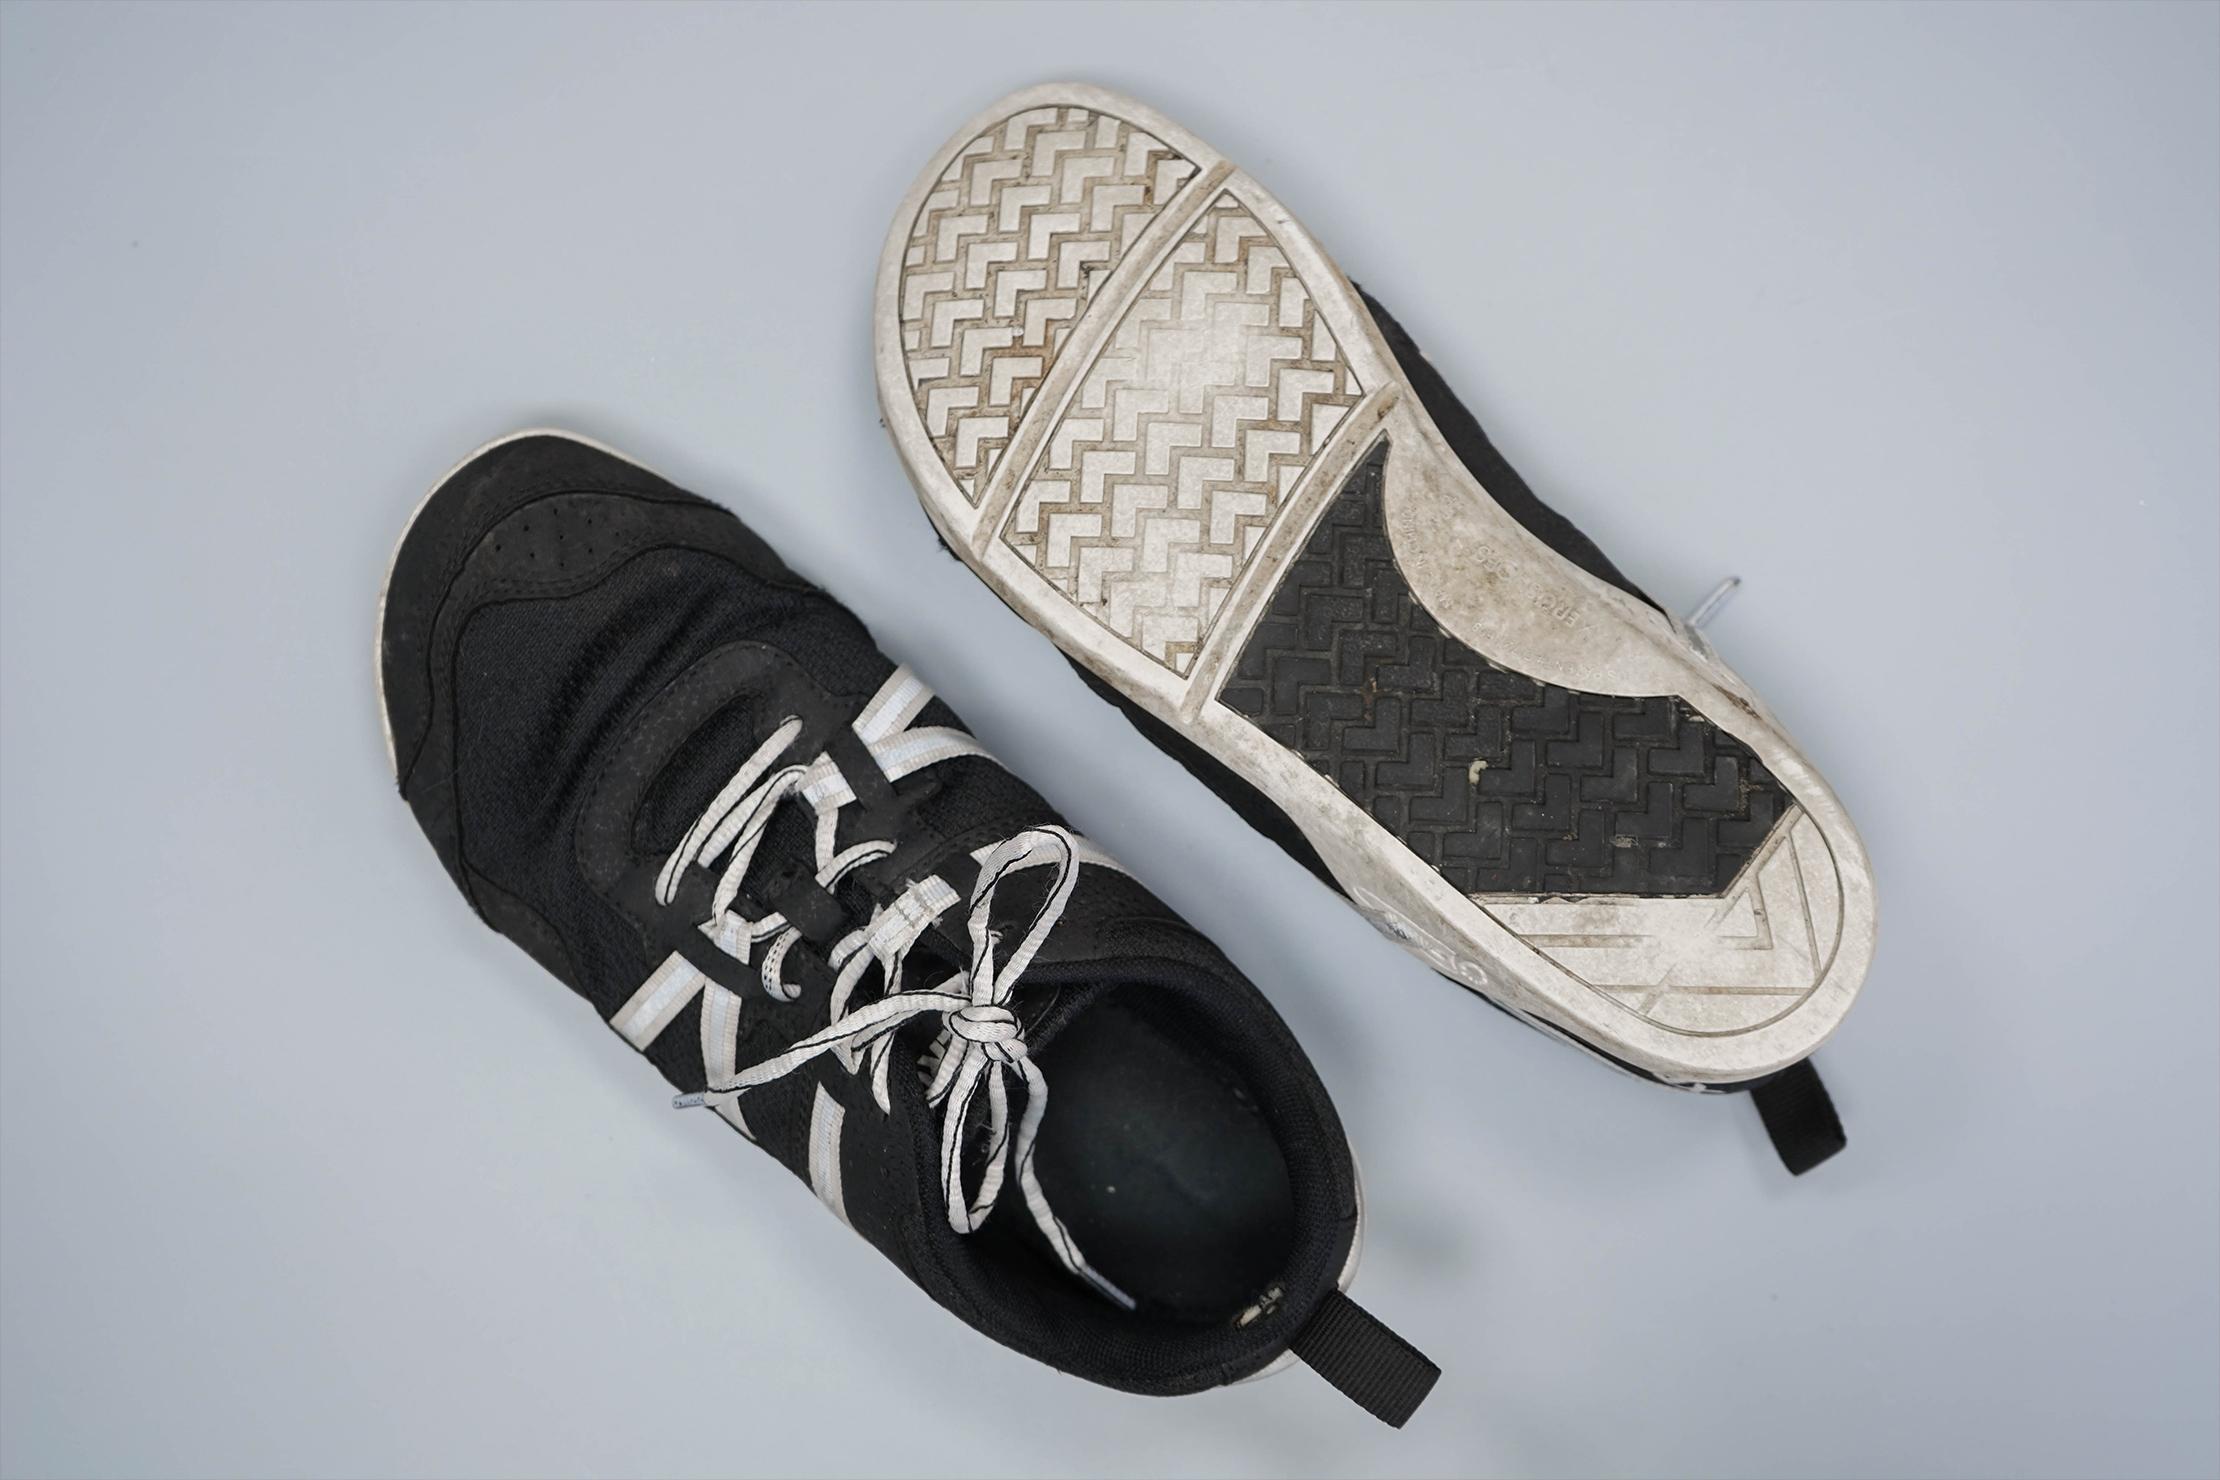 Xero Shoes Prio Top And Bottom